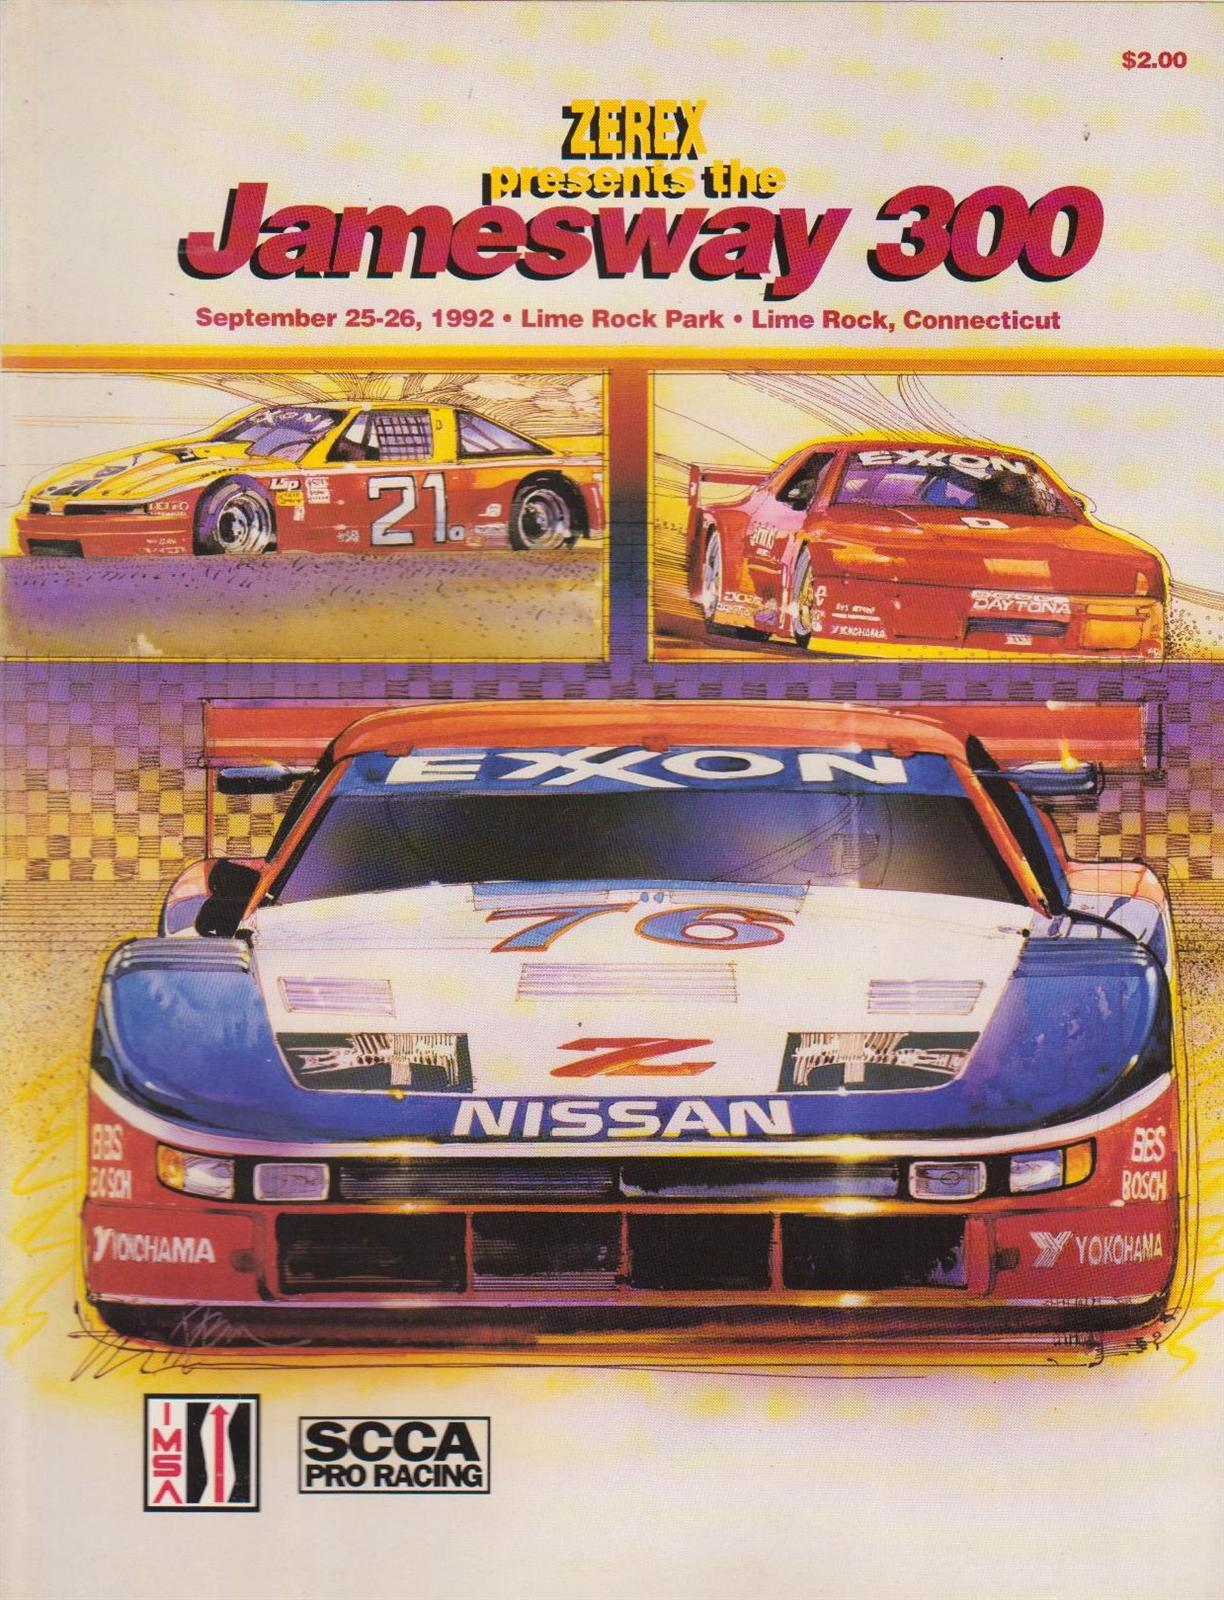 Mid Ohio Raceway >> 1992 IMSA GT Championship Programmes | The Motor Racing Programme Covers Project